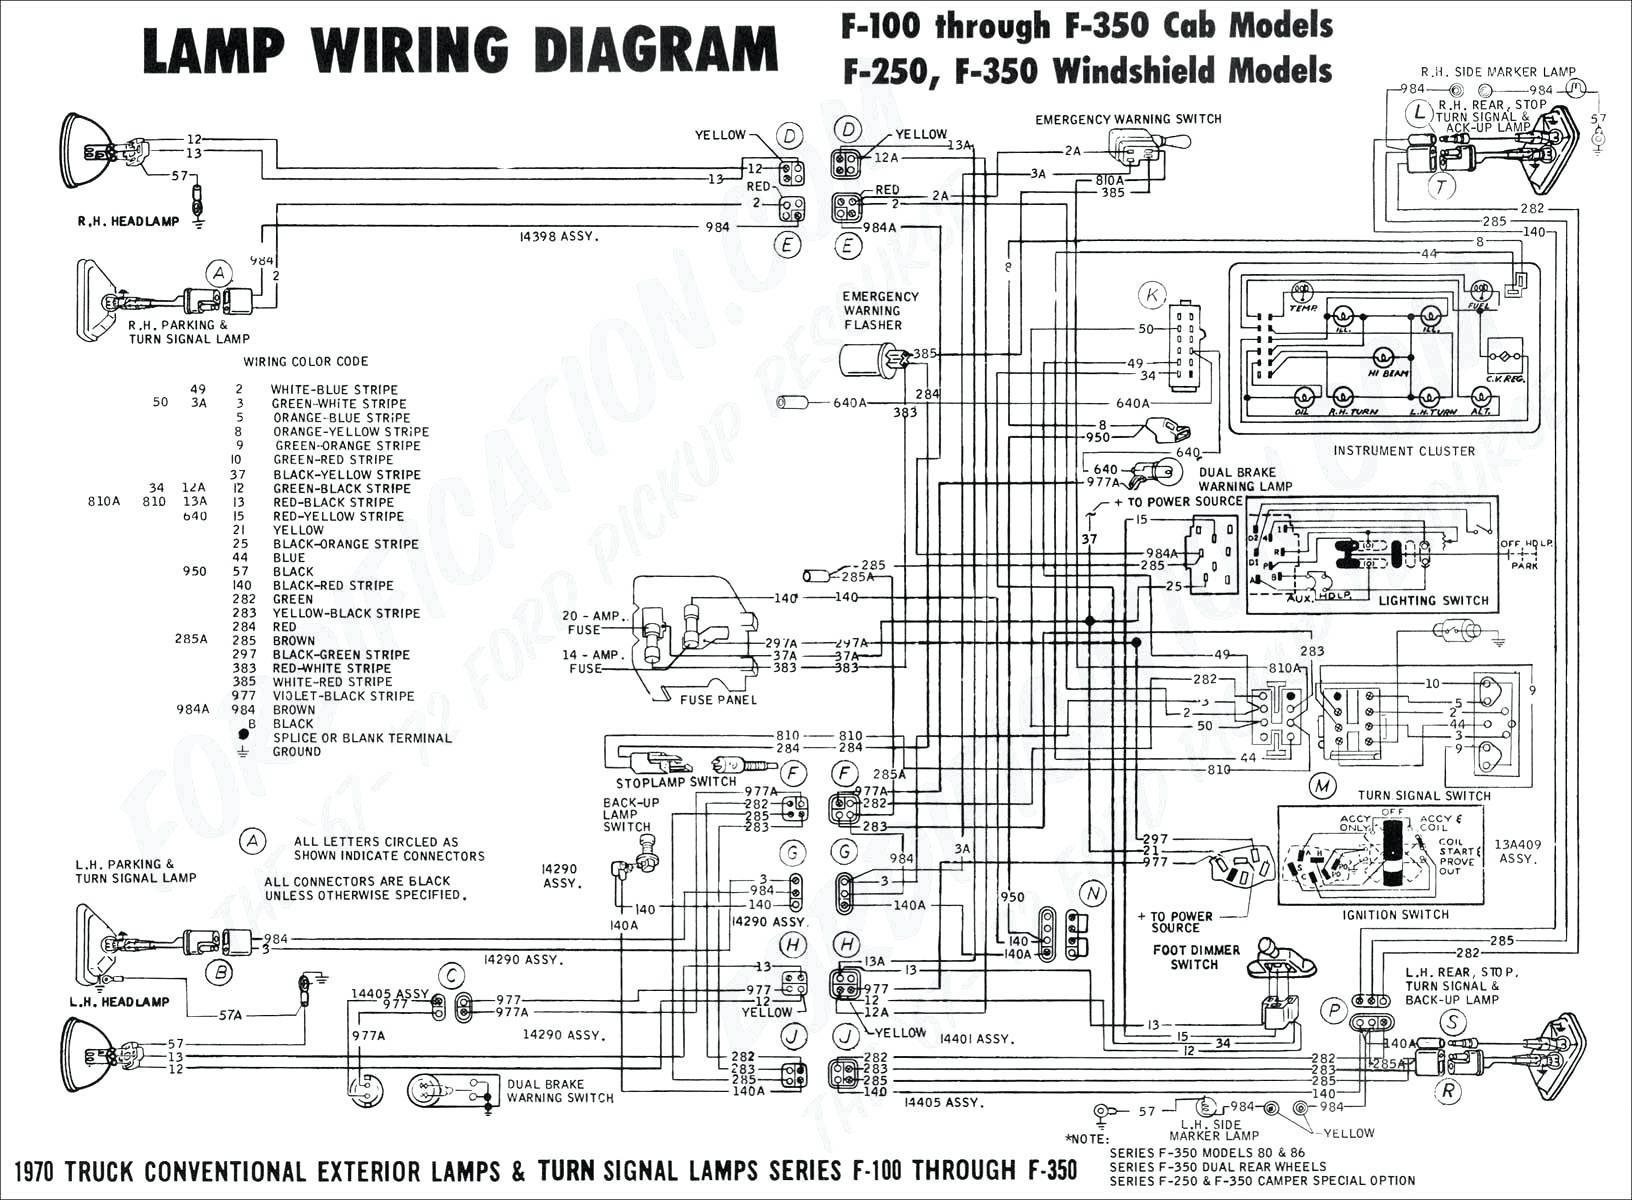 1977 Ford F 250 Engine Diagram Wiring Diagram pilation 78 Ford F100 Distributor Wiring Diagram